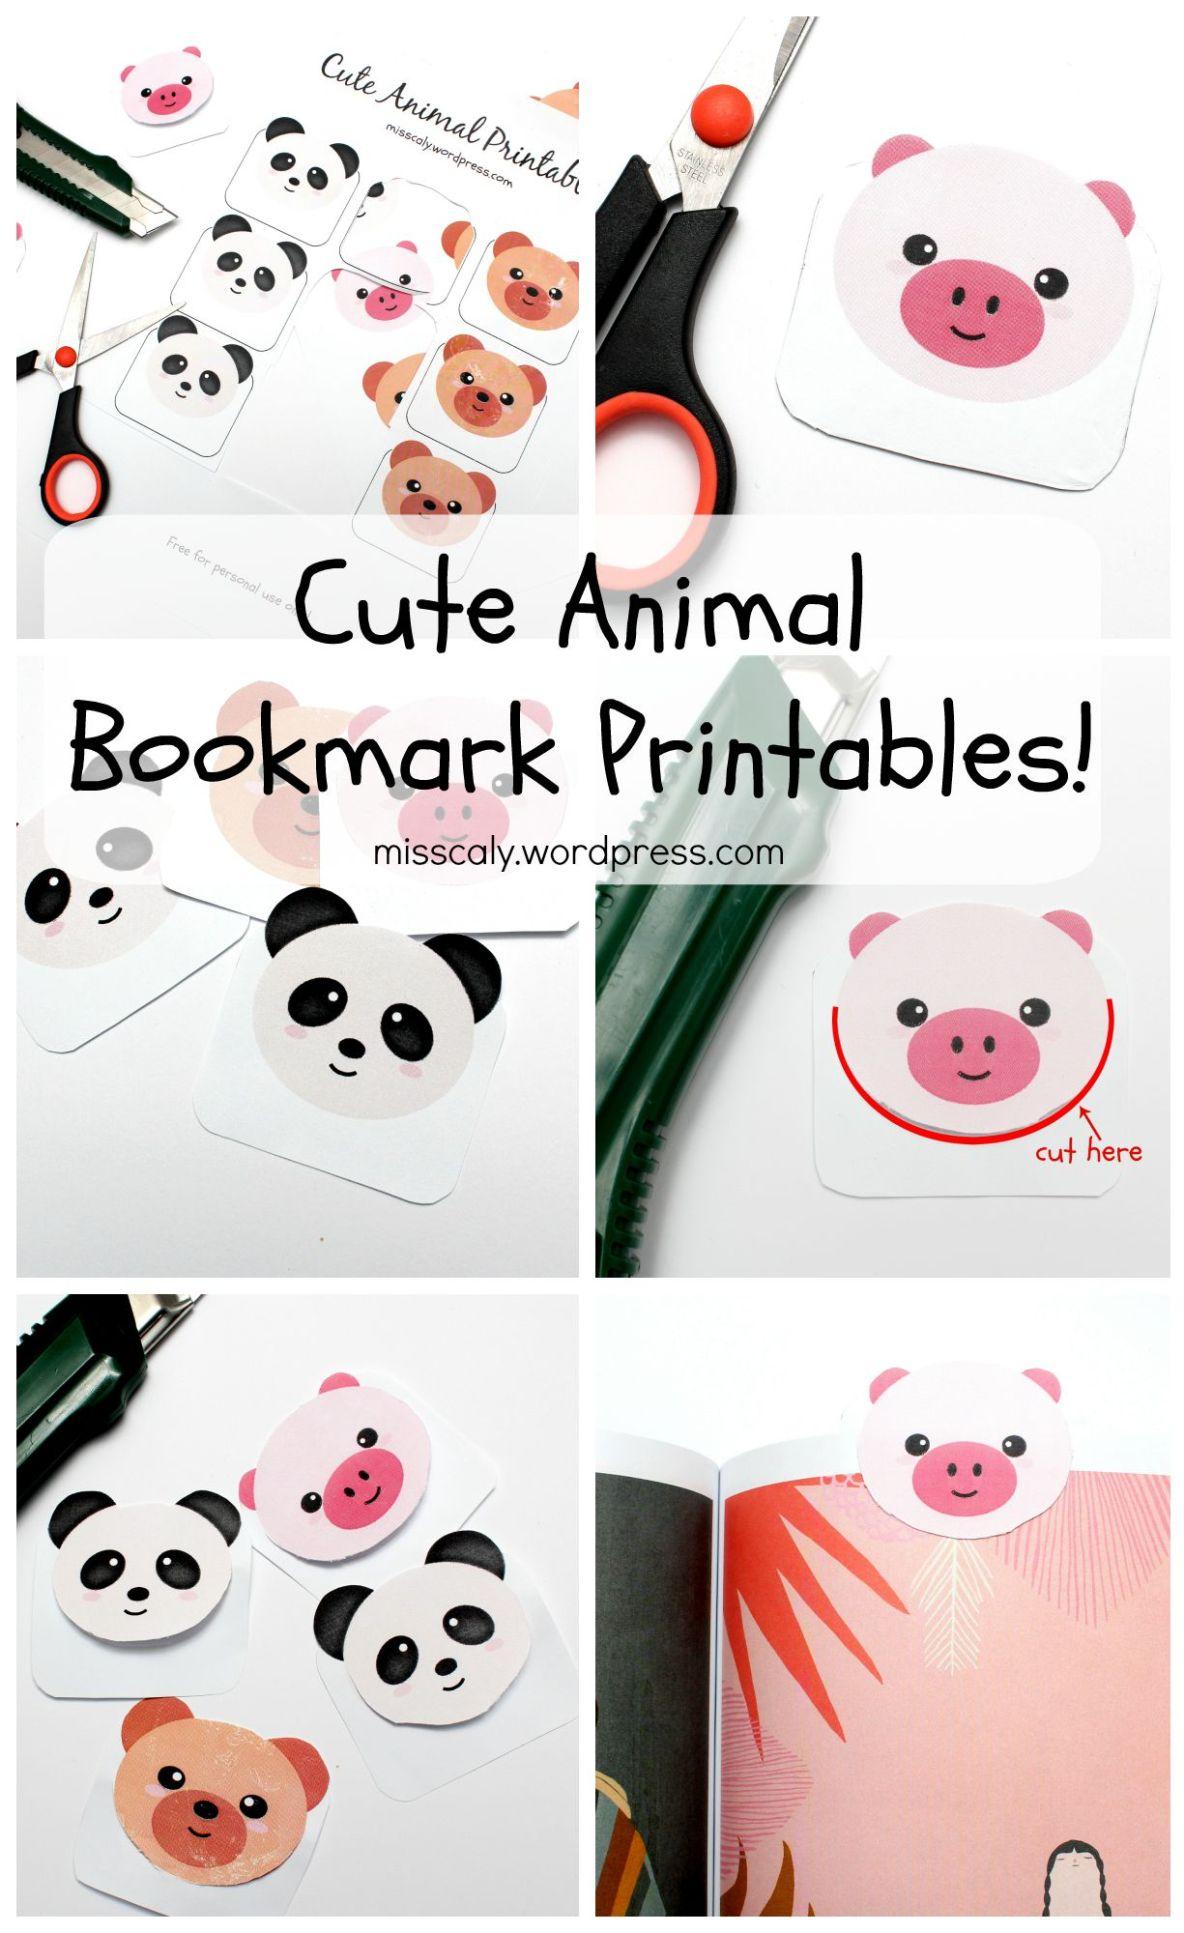 Cute animal bookmark printables